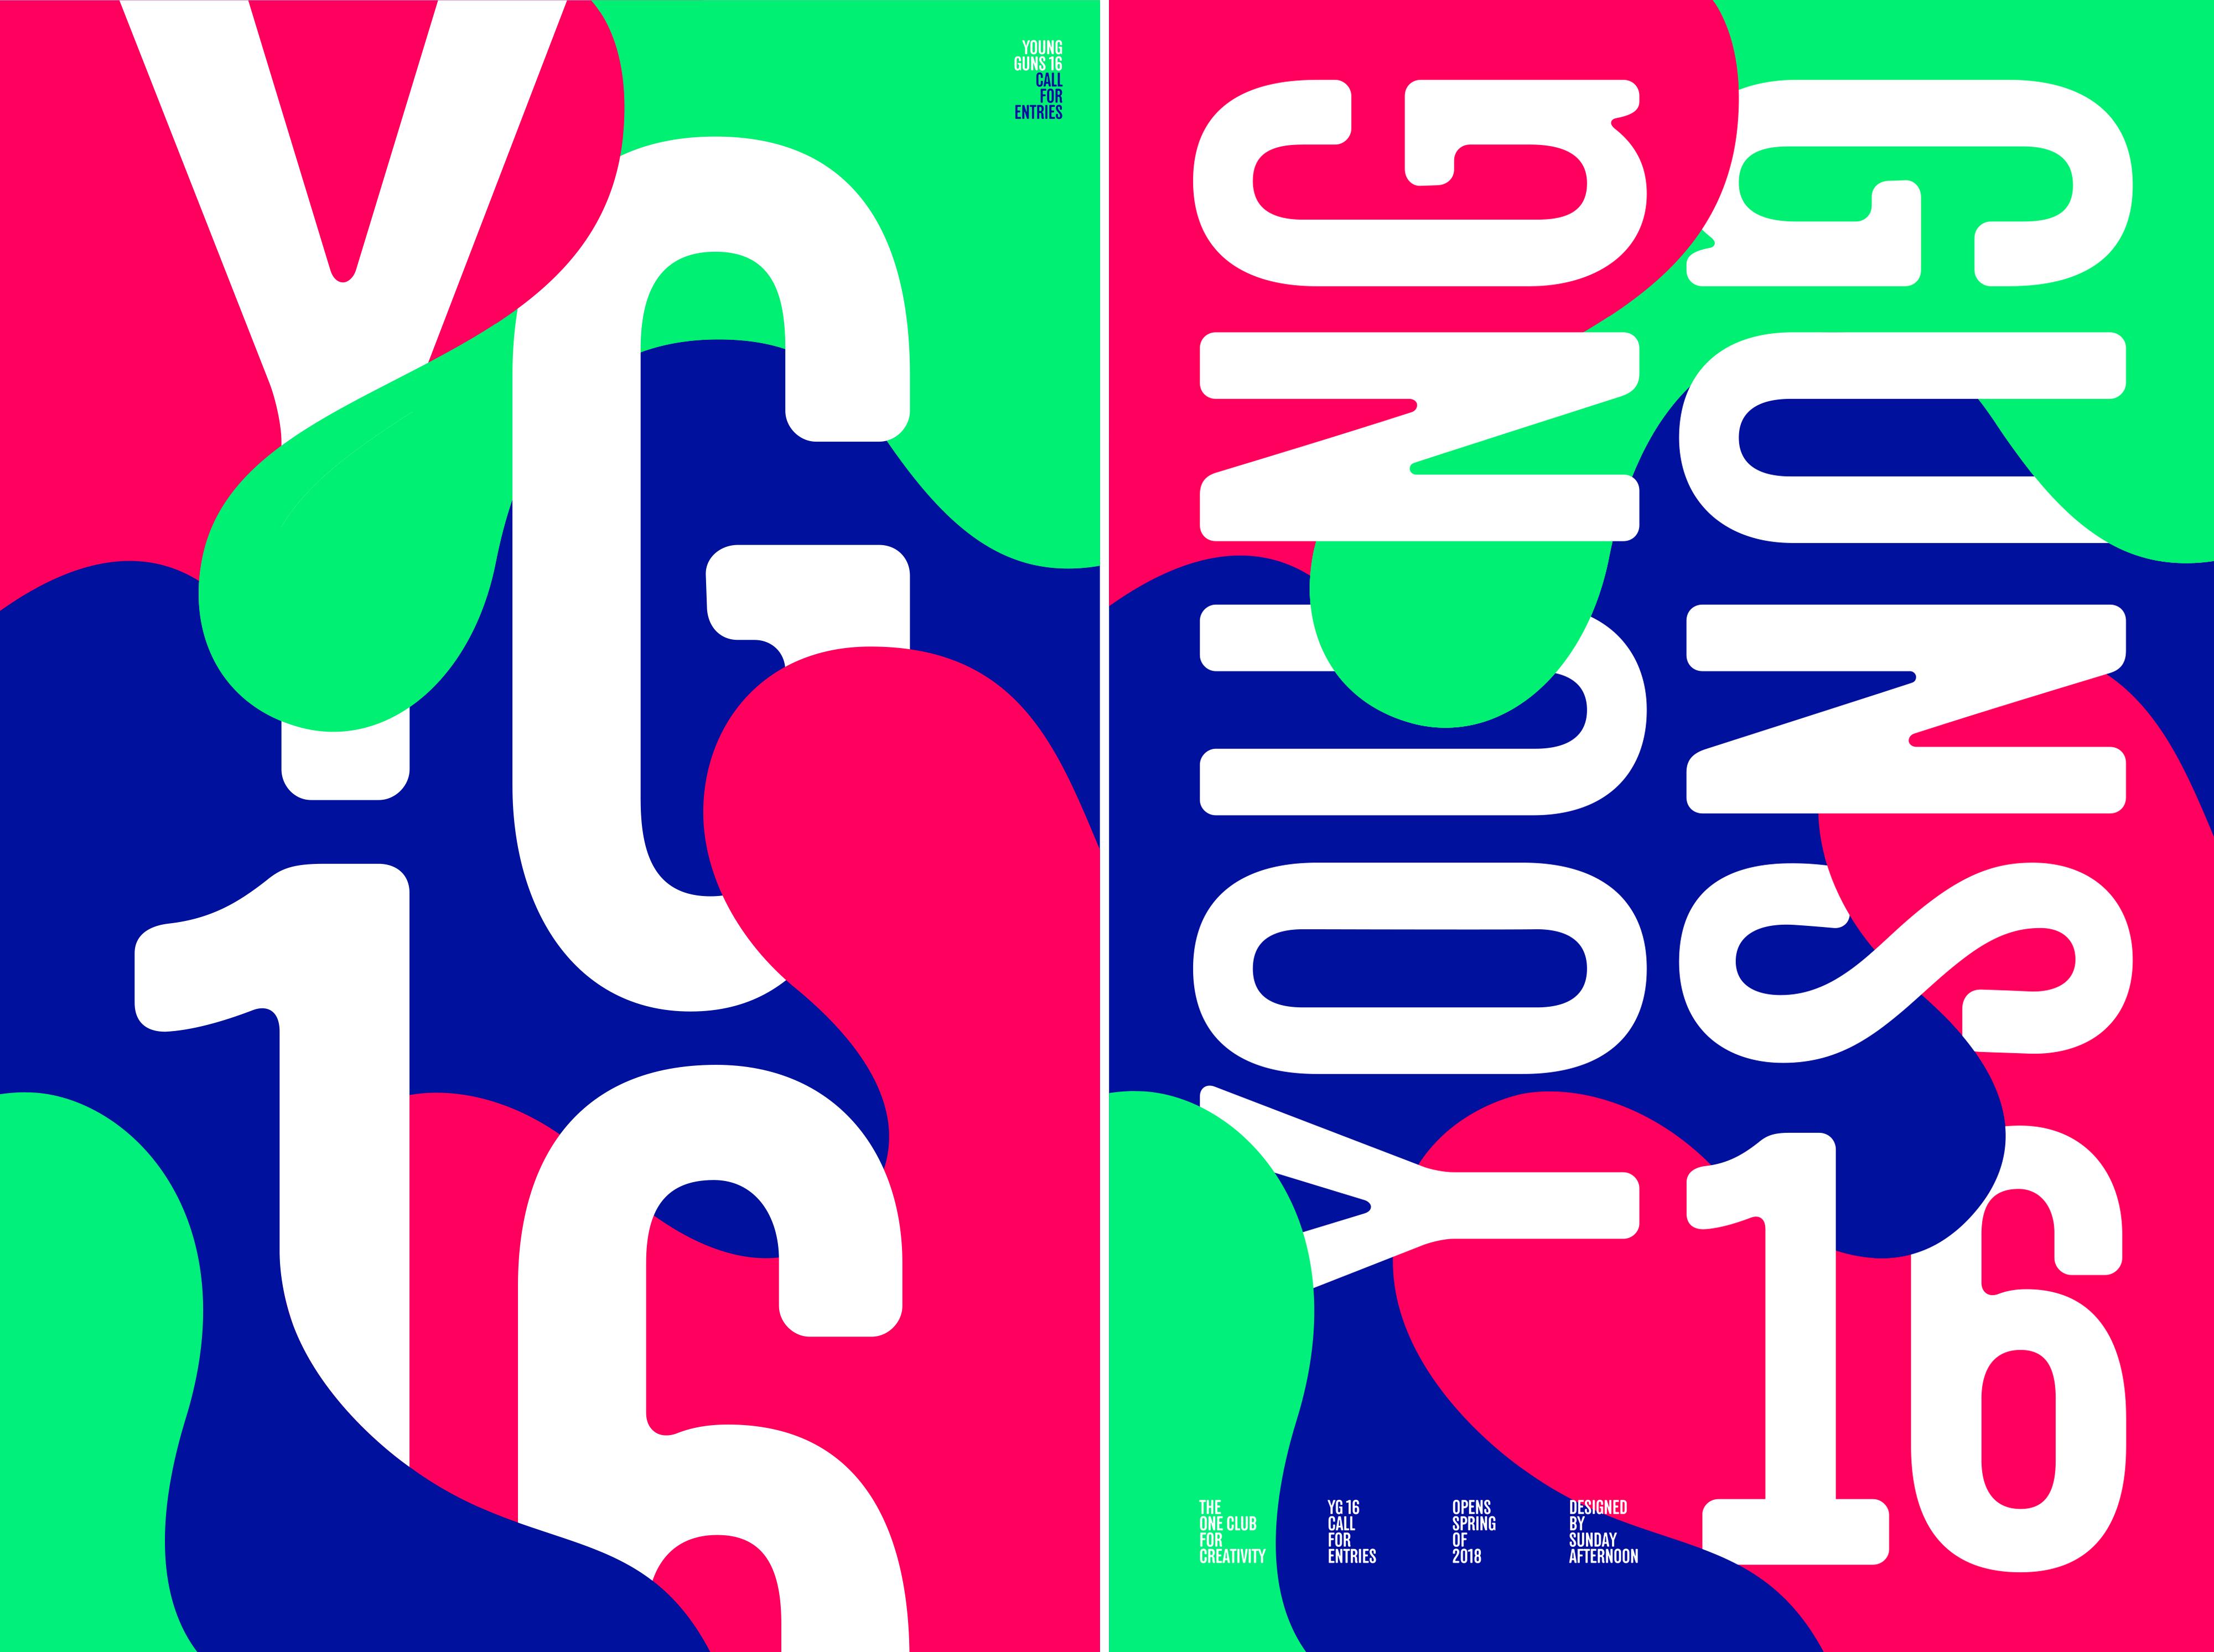 Yg posters website